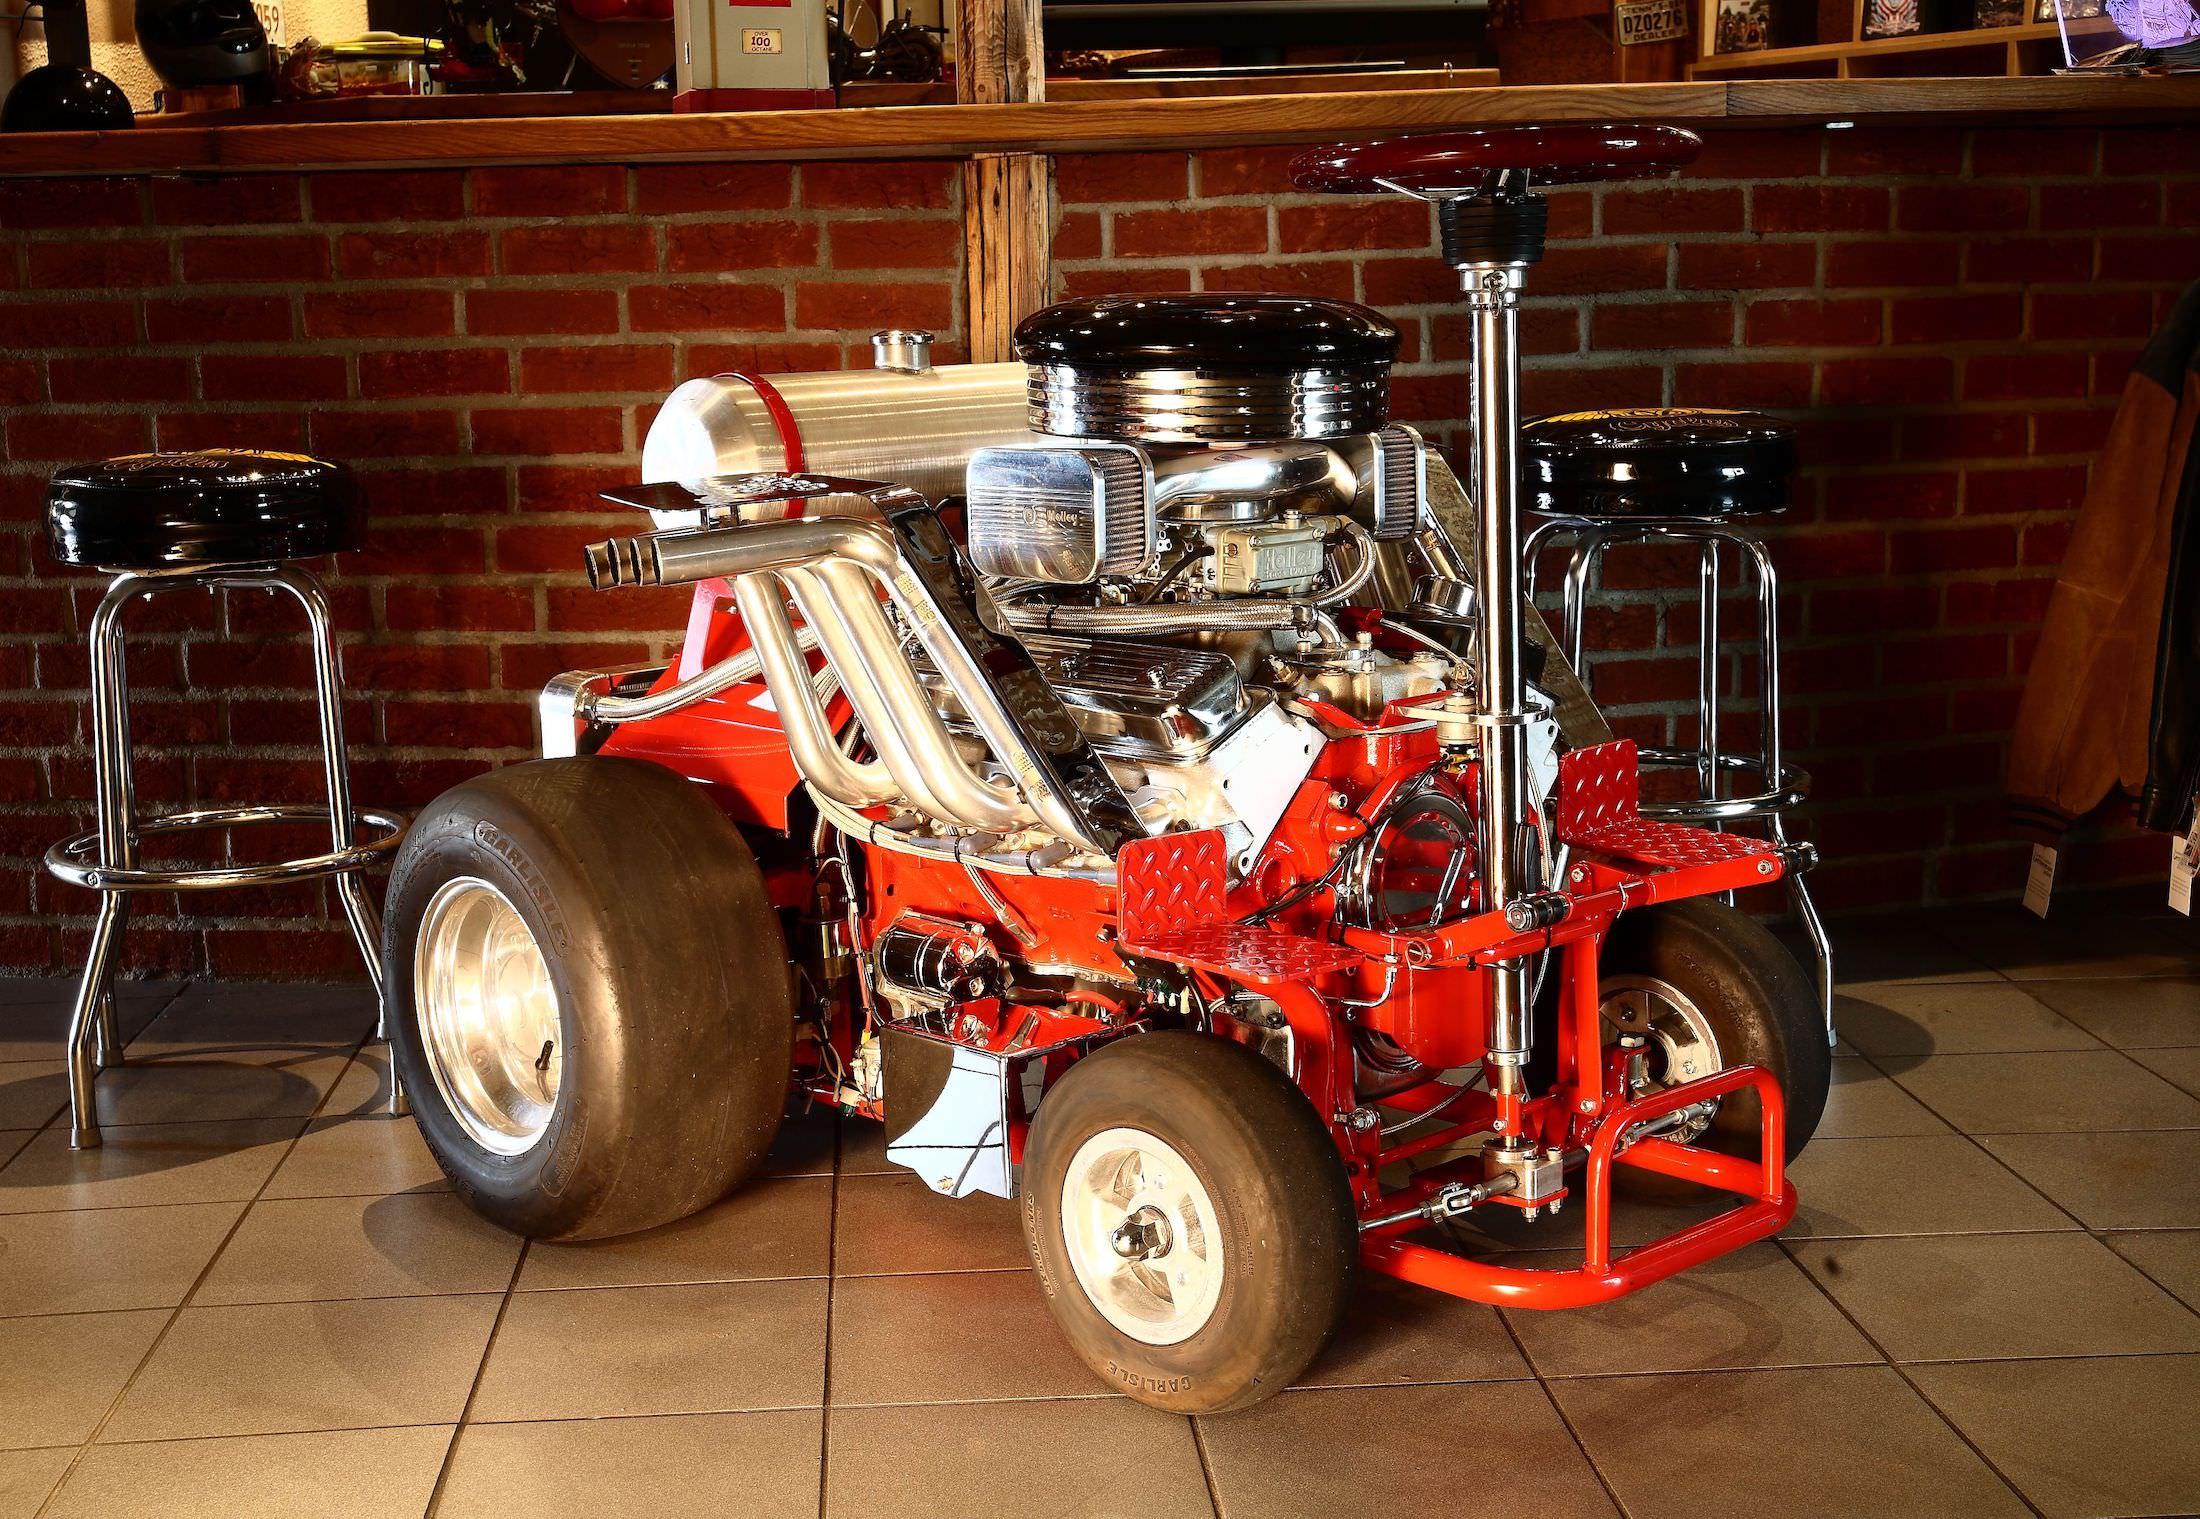 The Hoss Fly - A Chevrolet V8-Powered Bar Stool